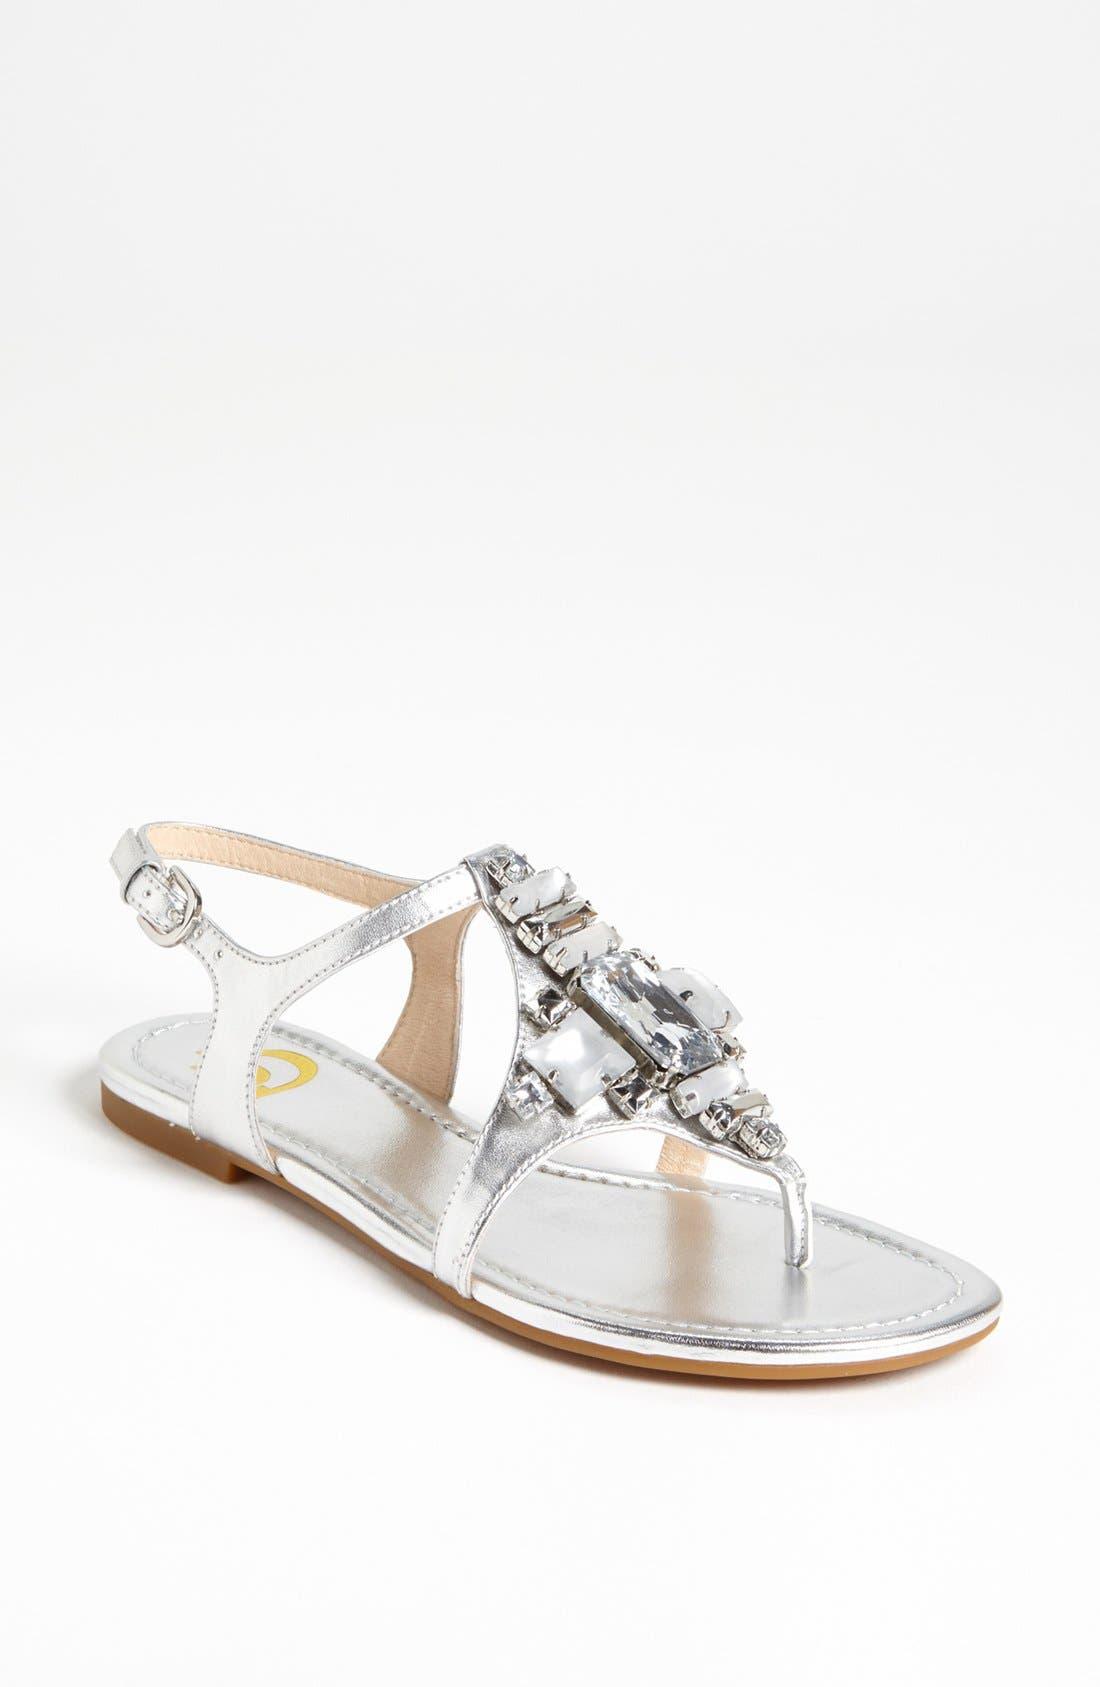 Main Image - Joan & David 'Kadison' Sandal (Special Purchase)